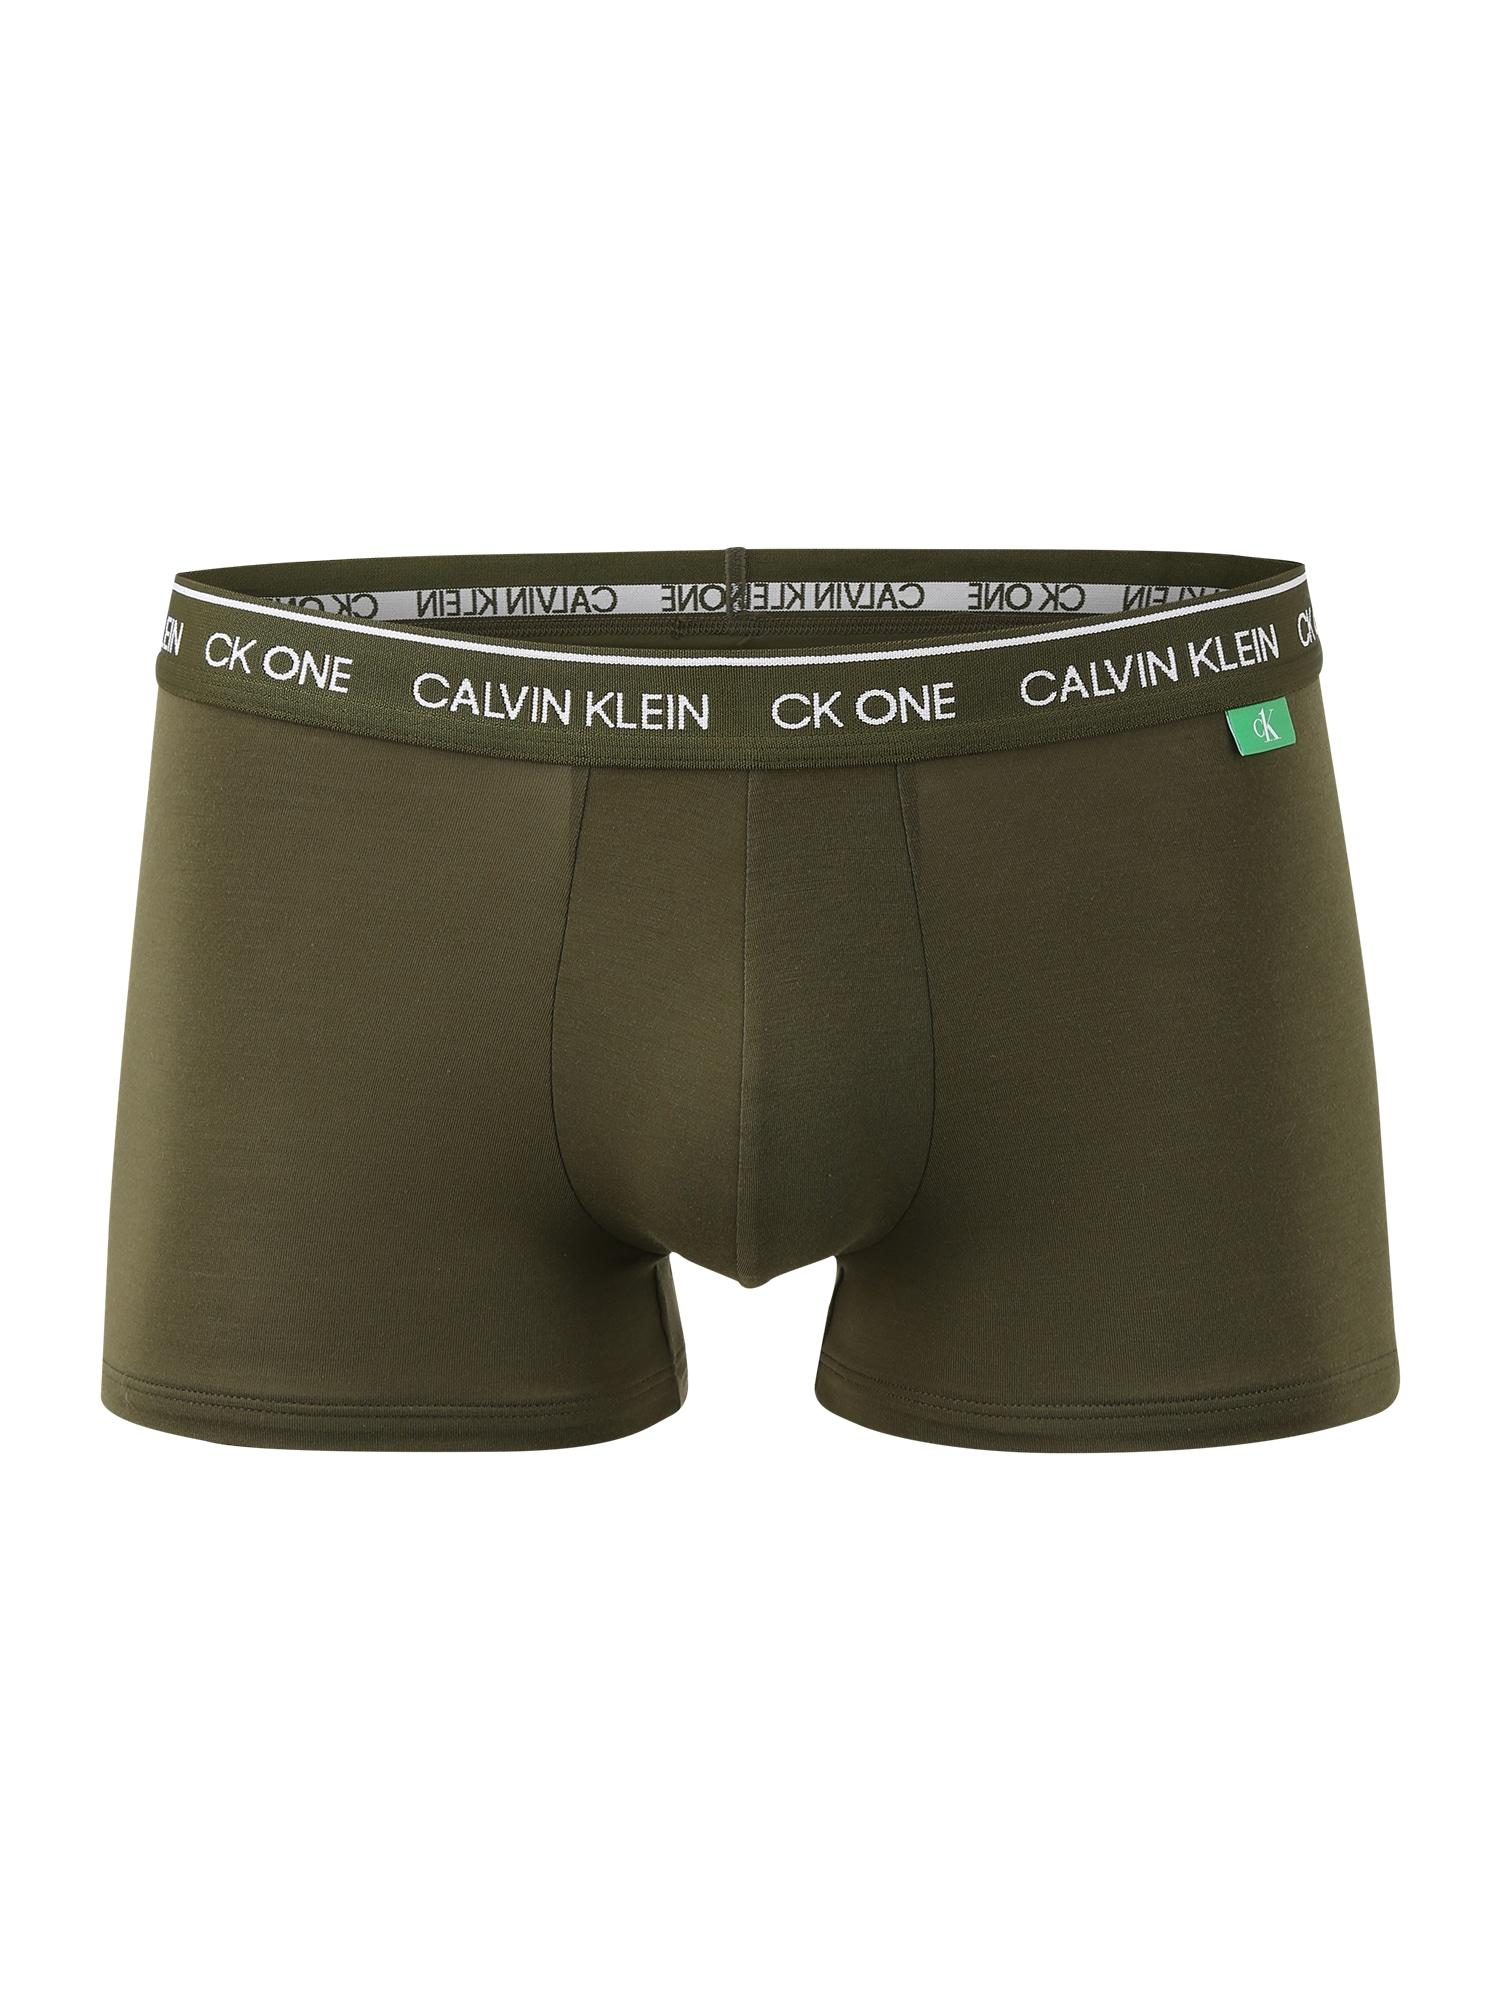 Calvin Klein Underwear Boxer trumpikės alyvuogių spalva / balta